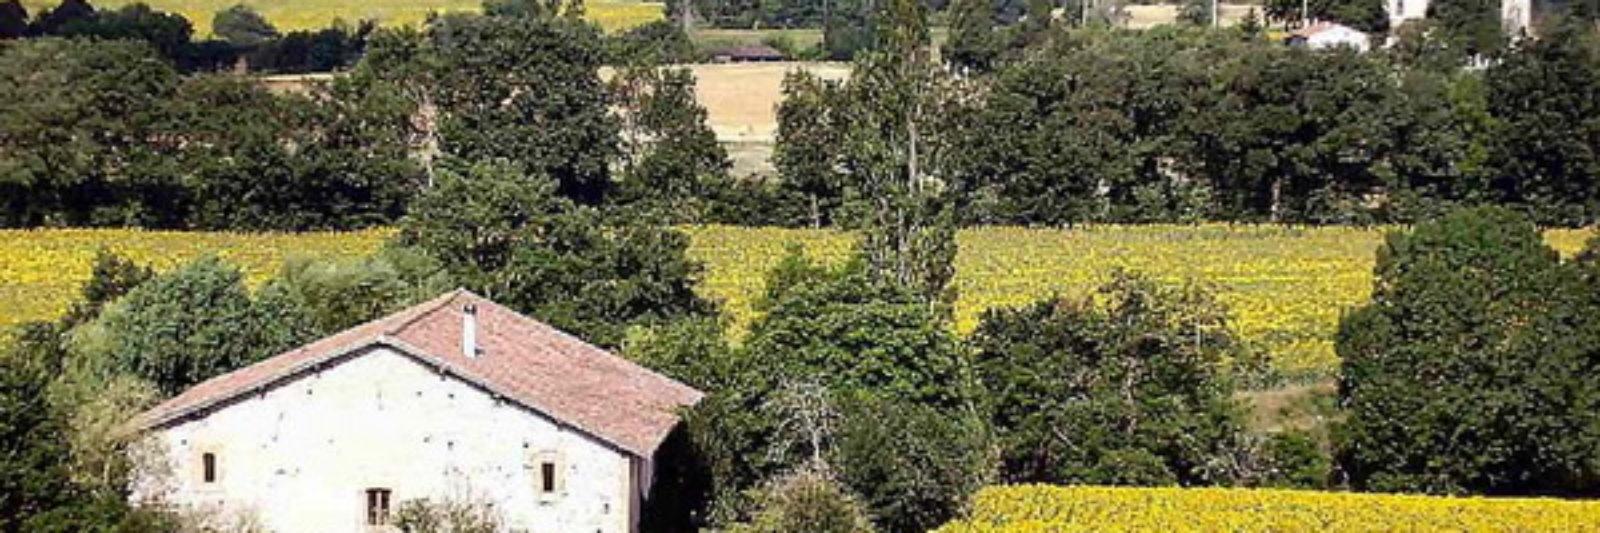 La Grange - Gite de France